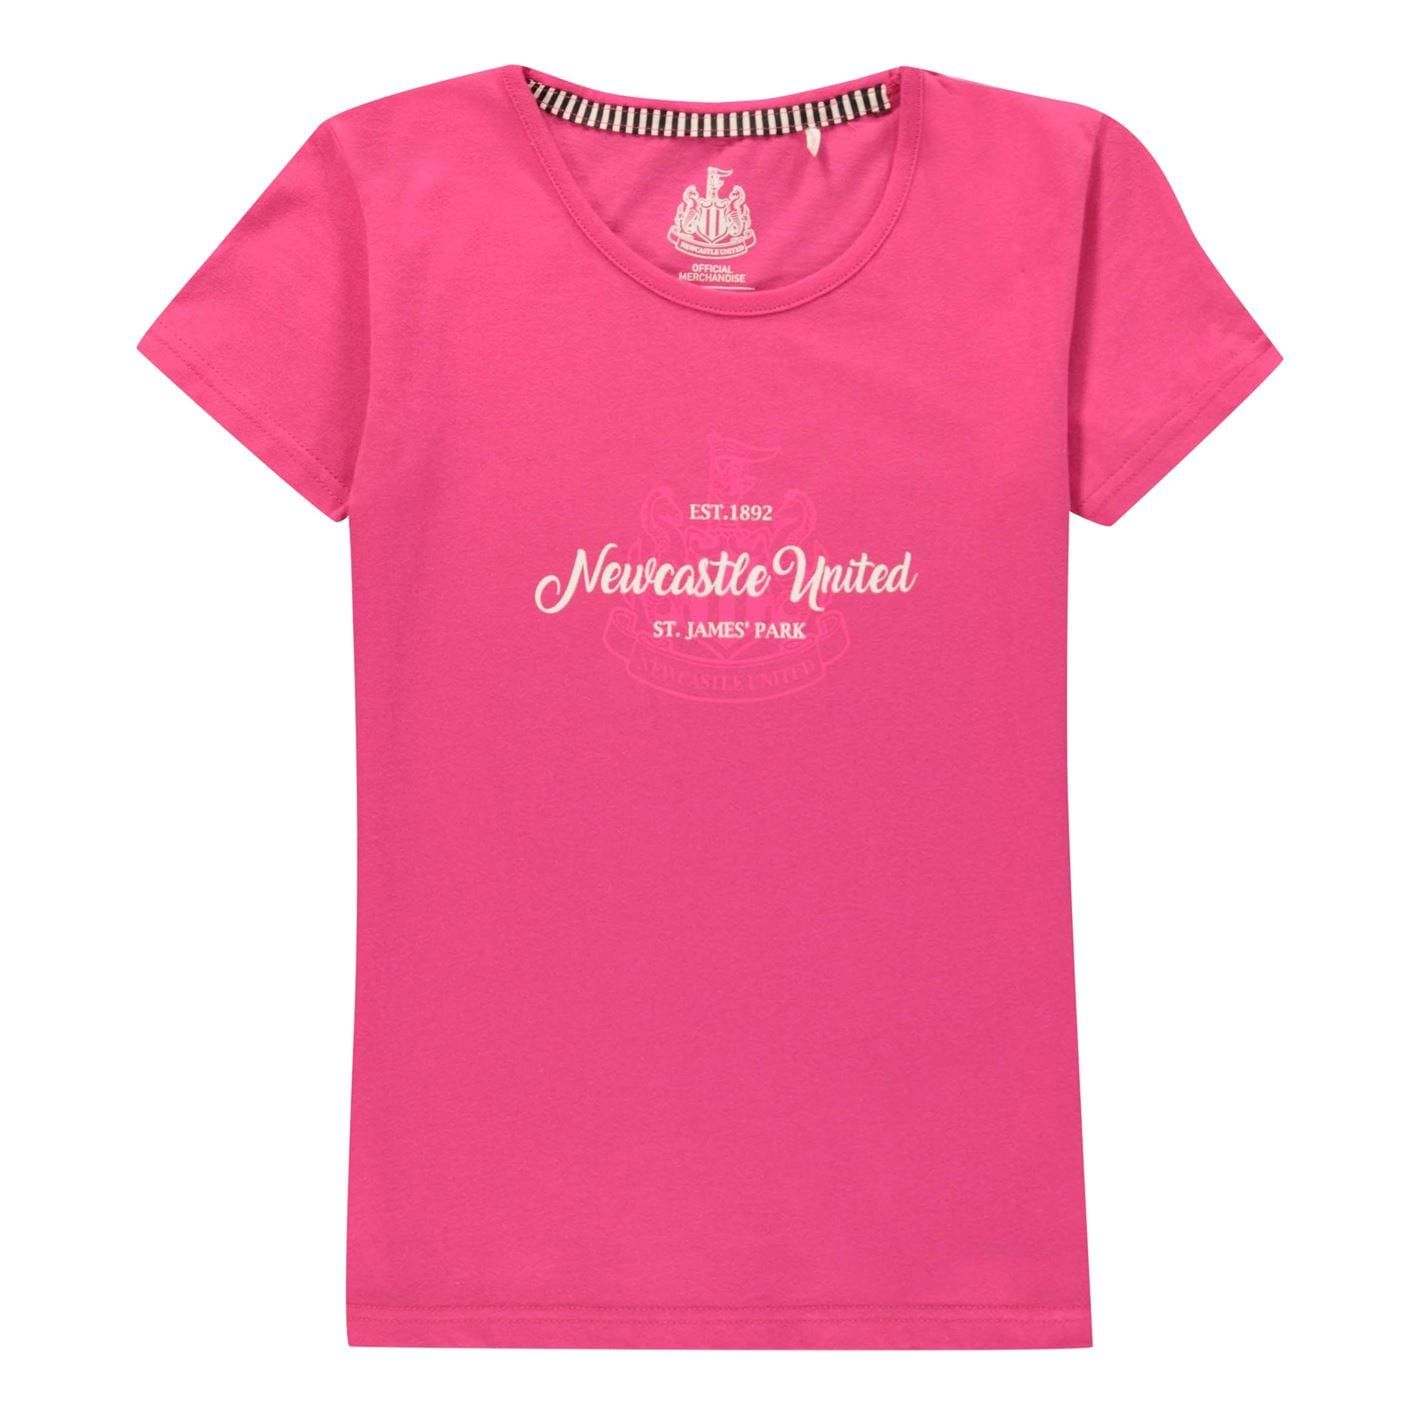 Team Kids Girls Newcastle United Crest Print T-Shirt Junior Crew Neck Tee Top